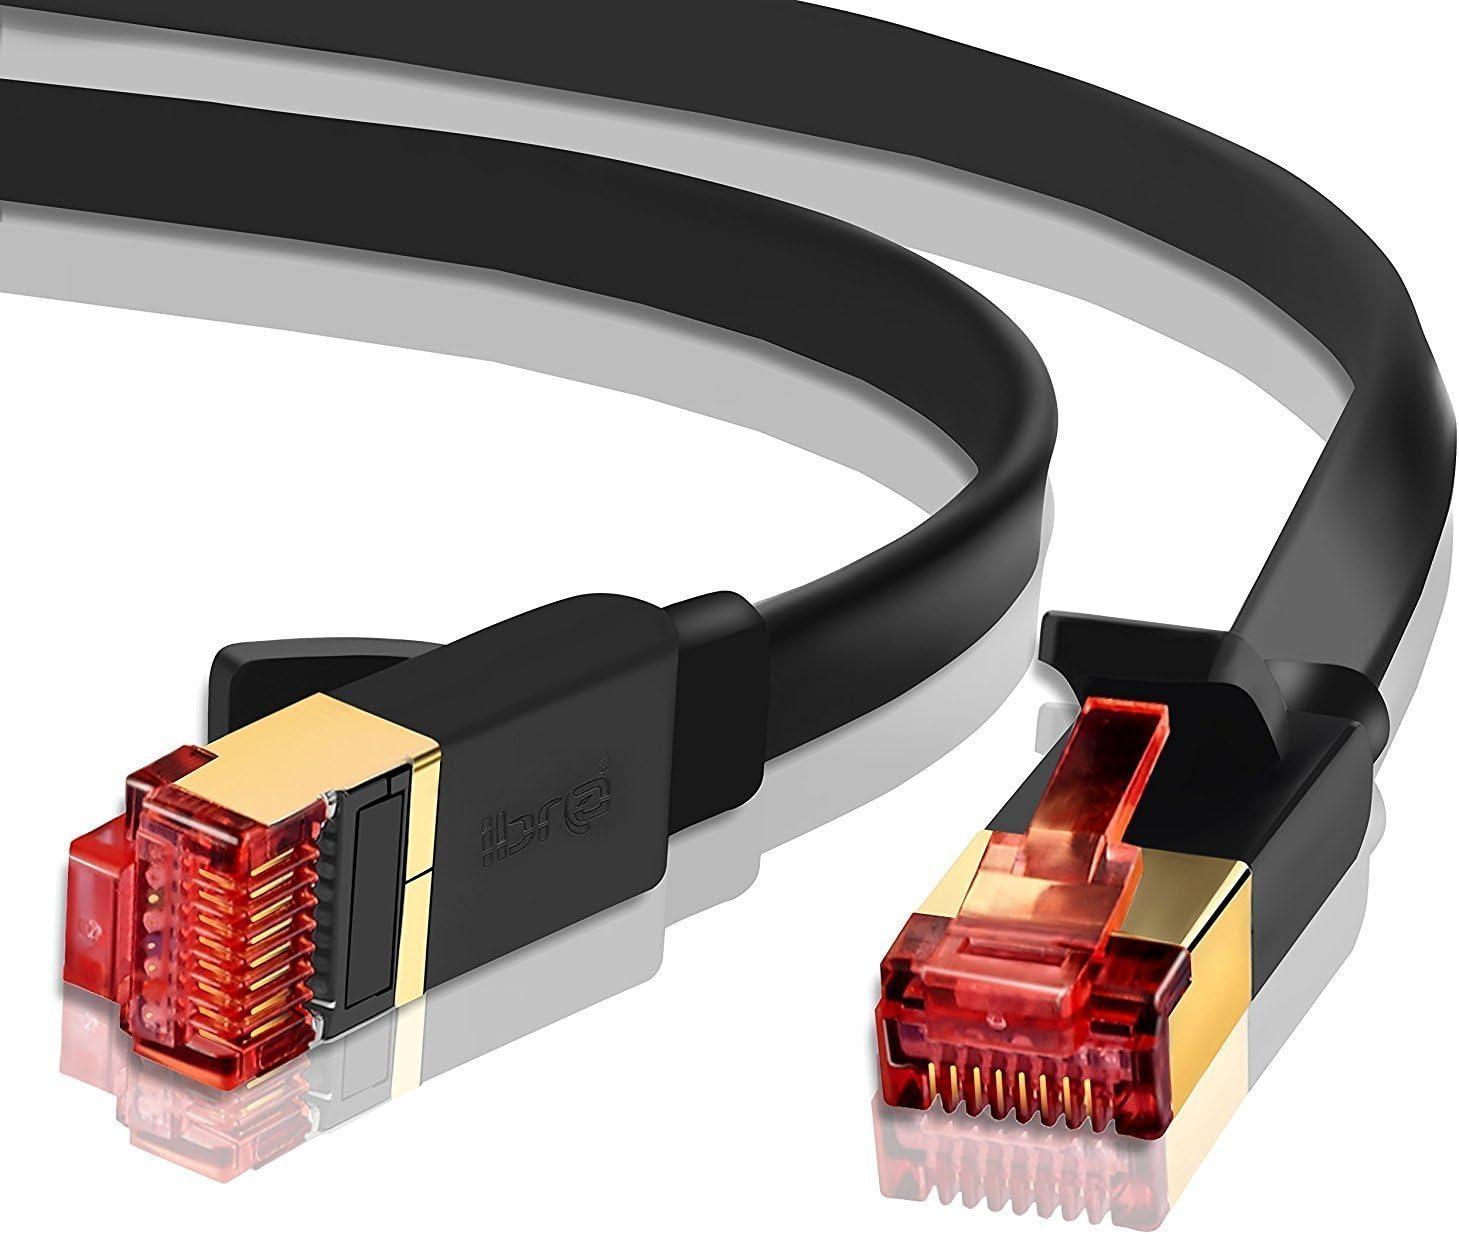 RJ45 Redondo Negro 1M SSTP 40Gbps 2000Mhz IBRA Cable de Red LAN Gigabit Ethernet CAT8